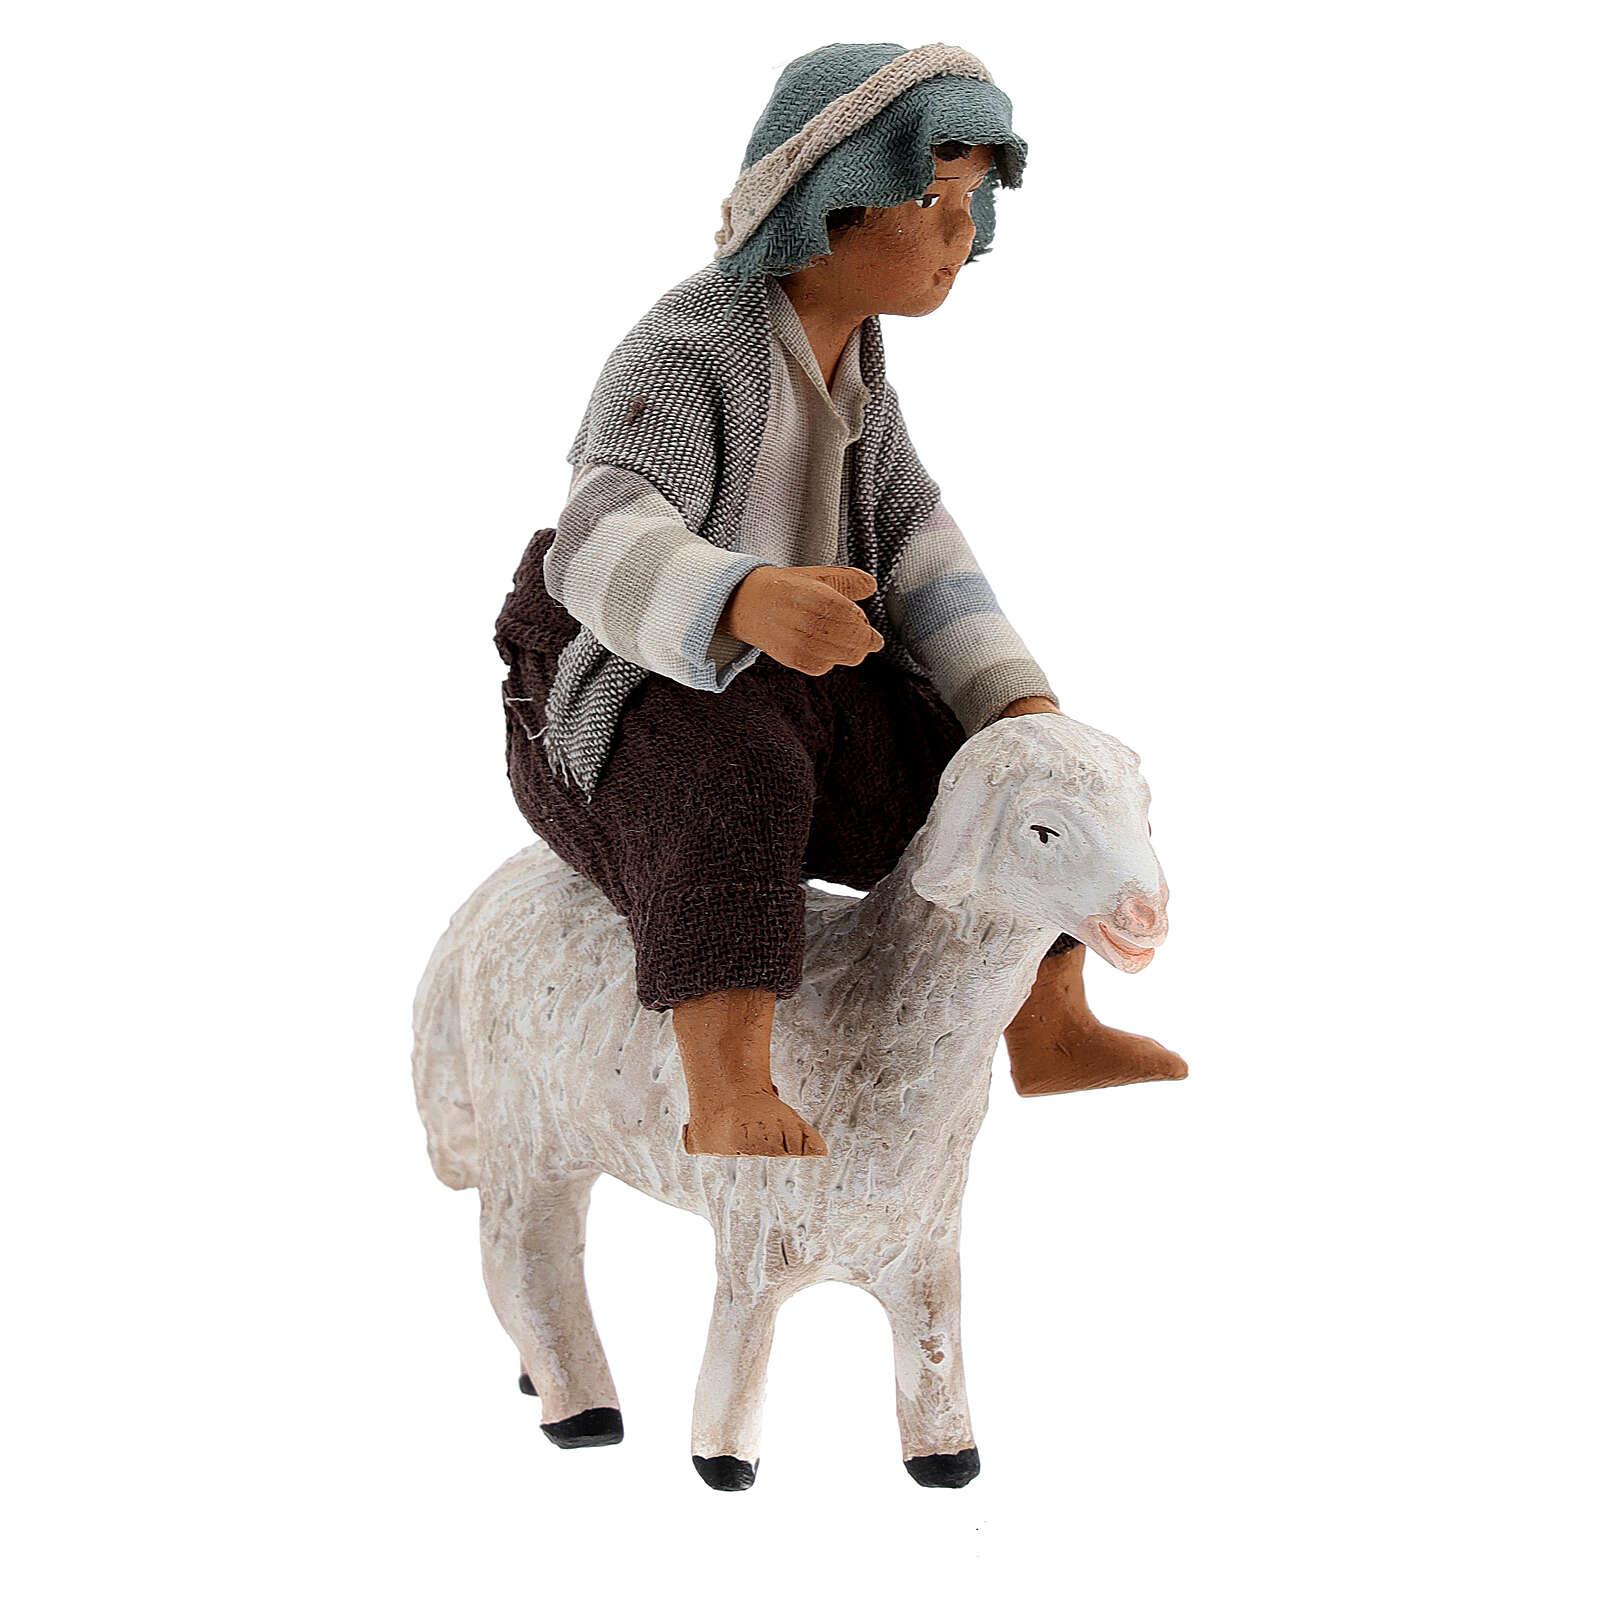 Boy on sheep Neapolitan nativity scene figurine 13 cm 4